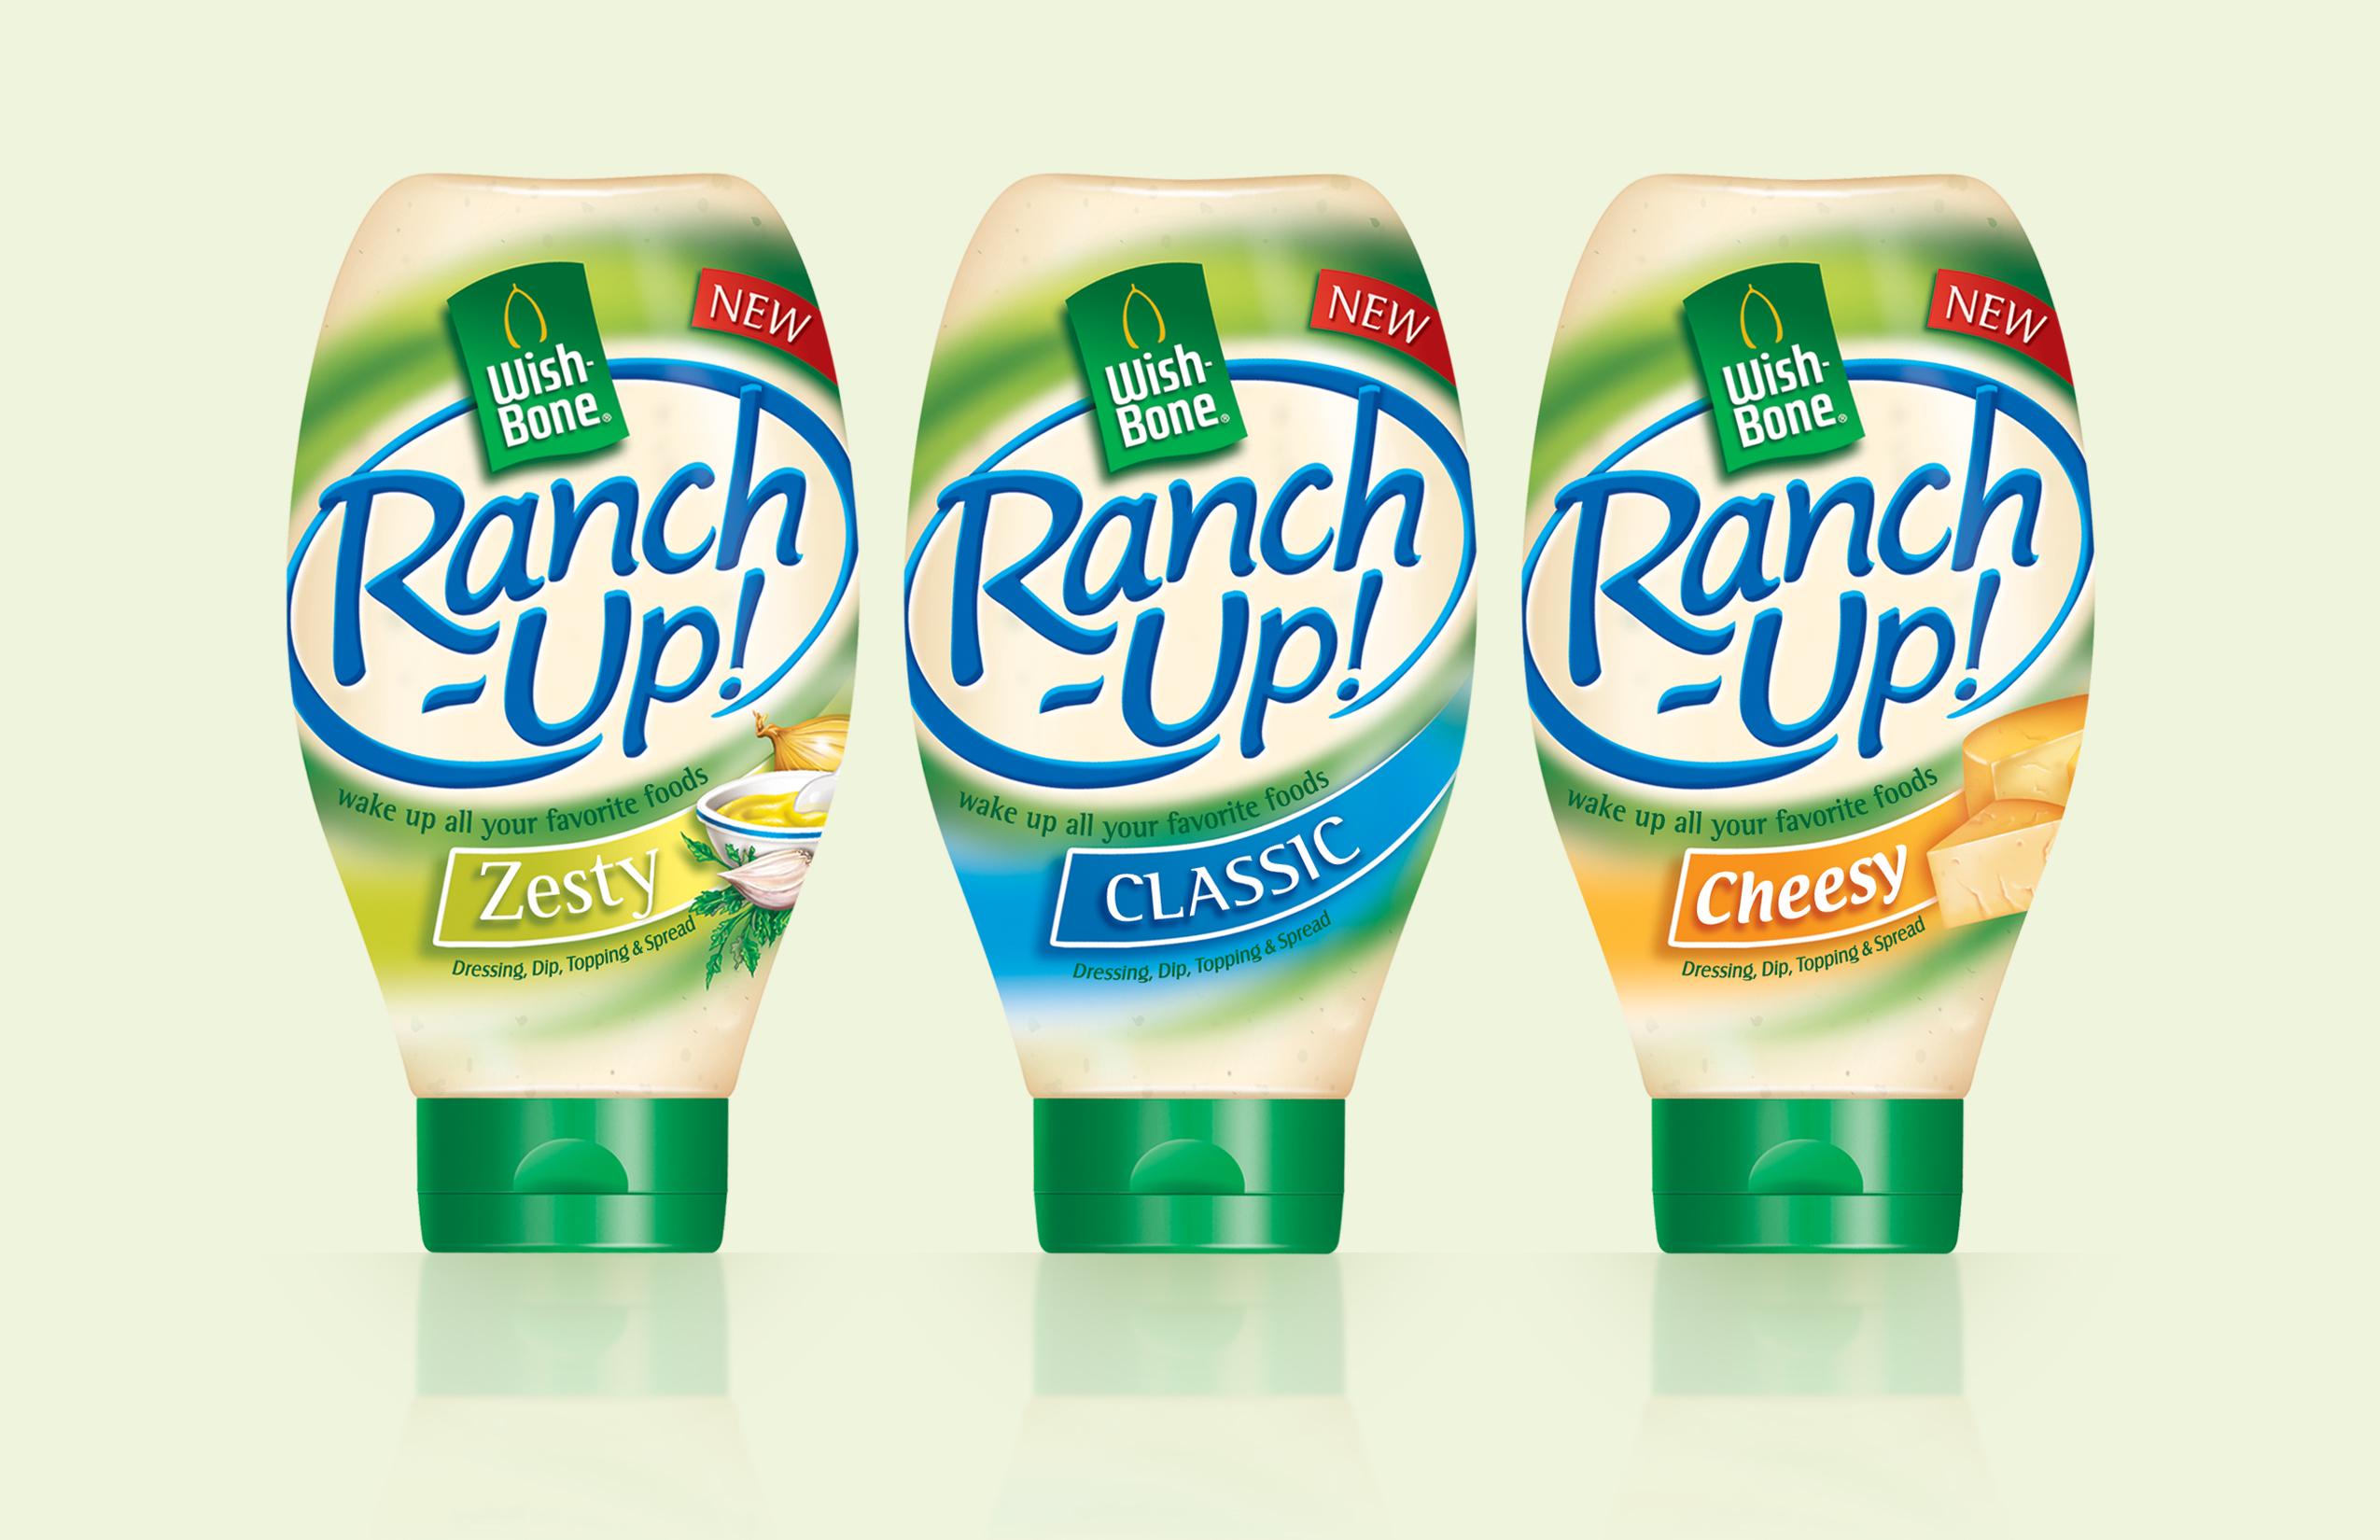 Ranch-Up